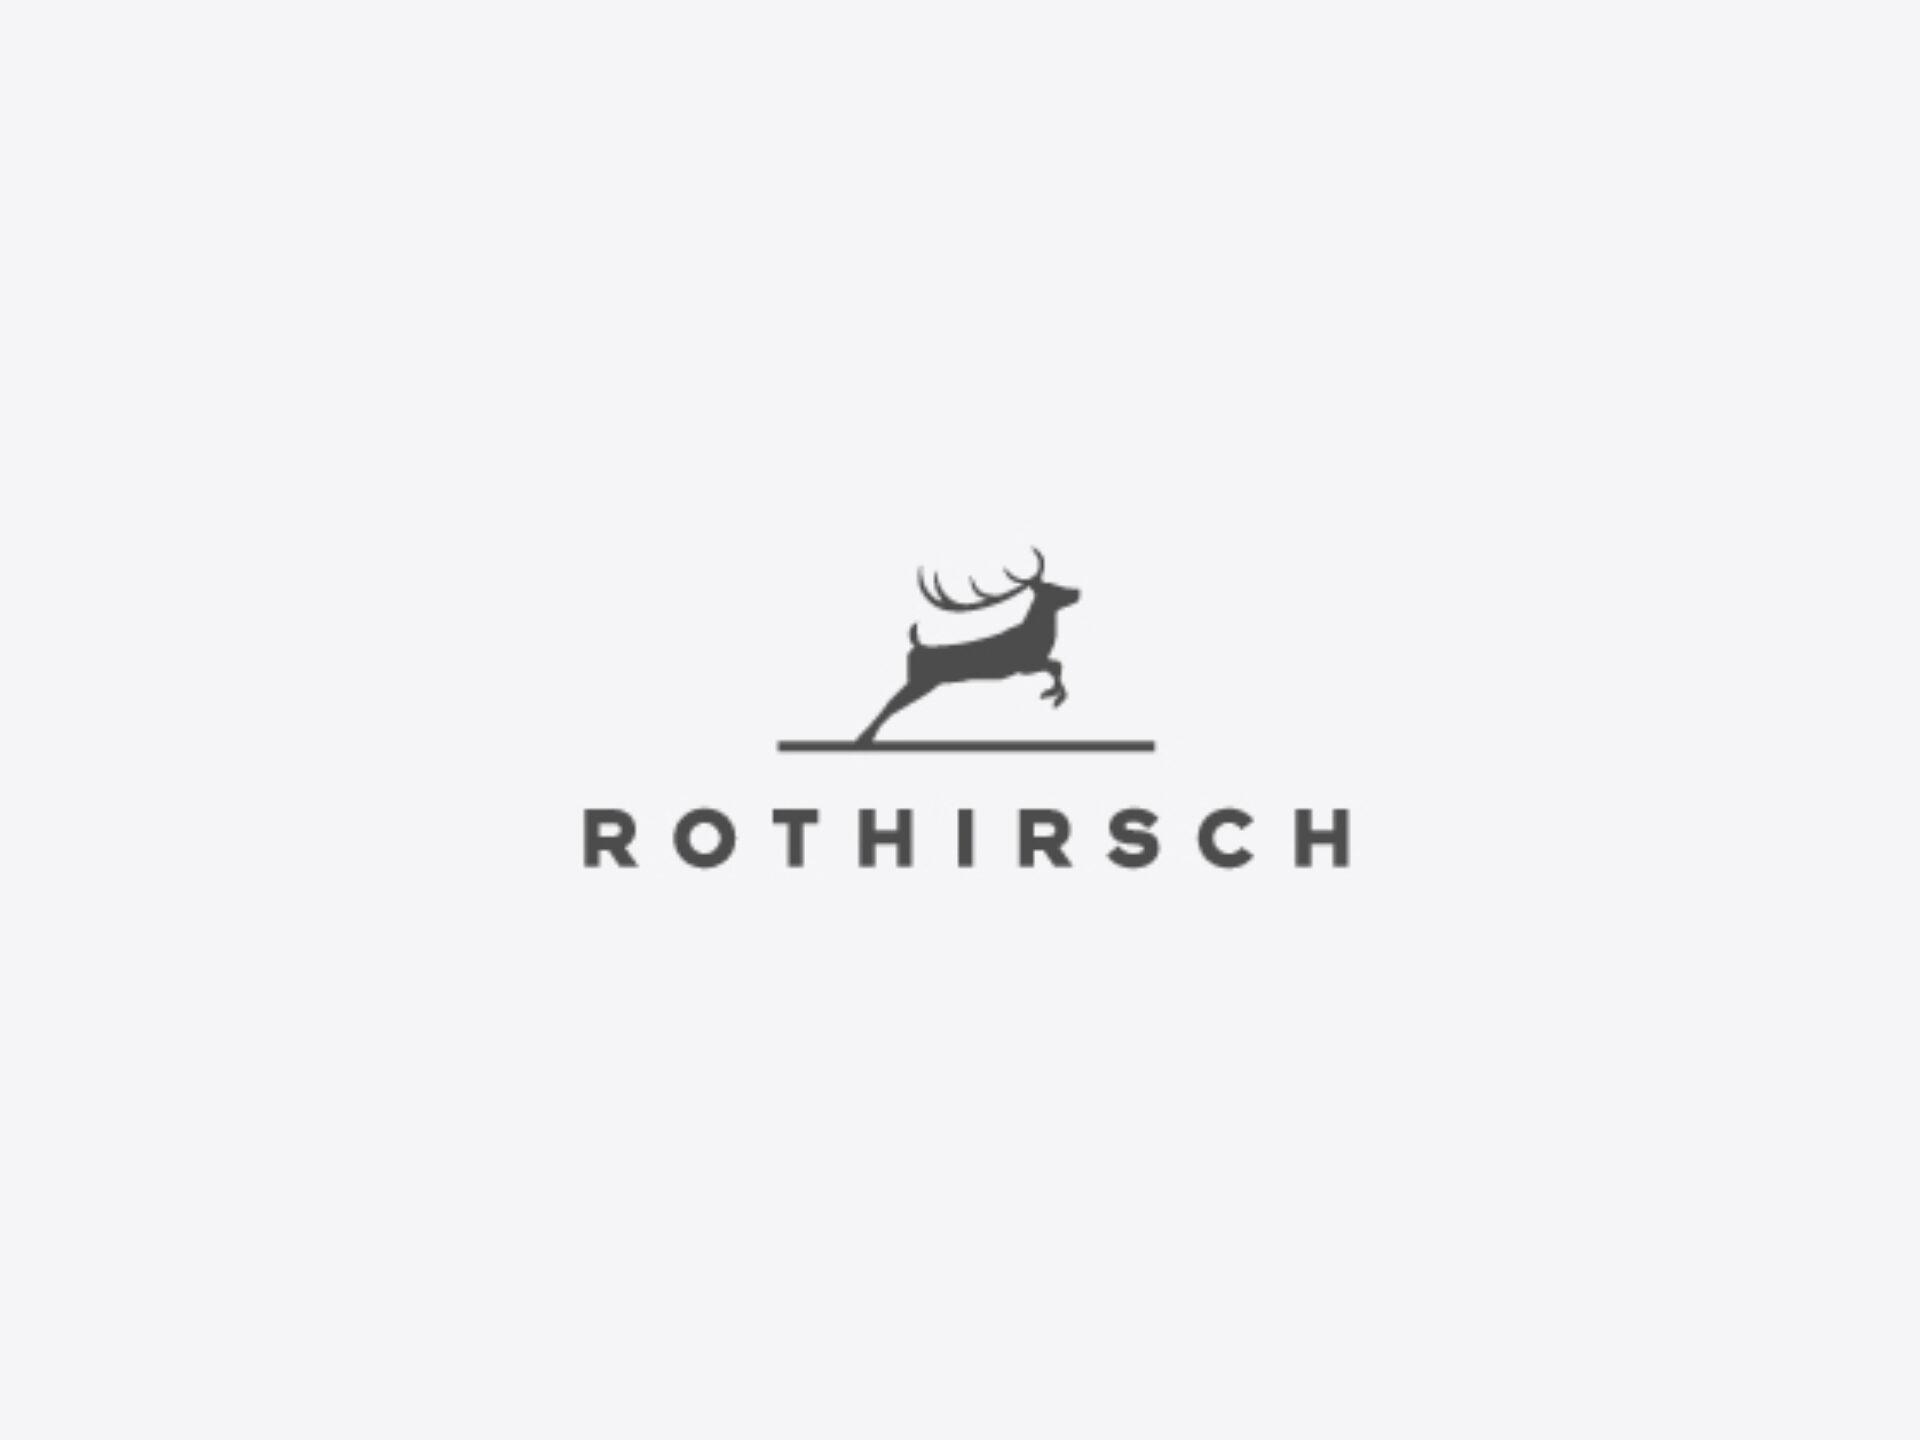 Manroof Referenz Rothirsch